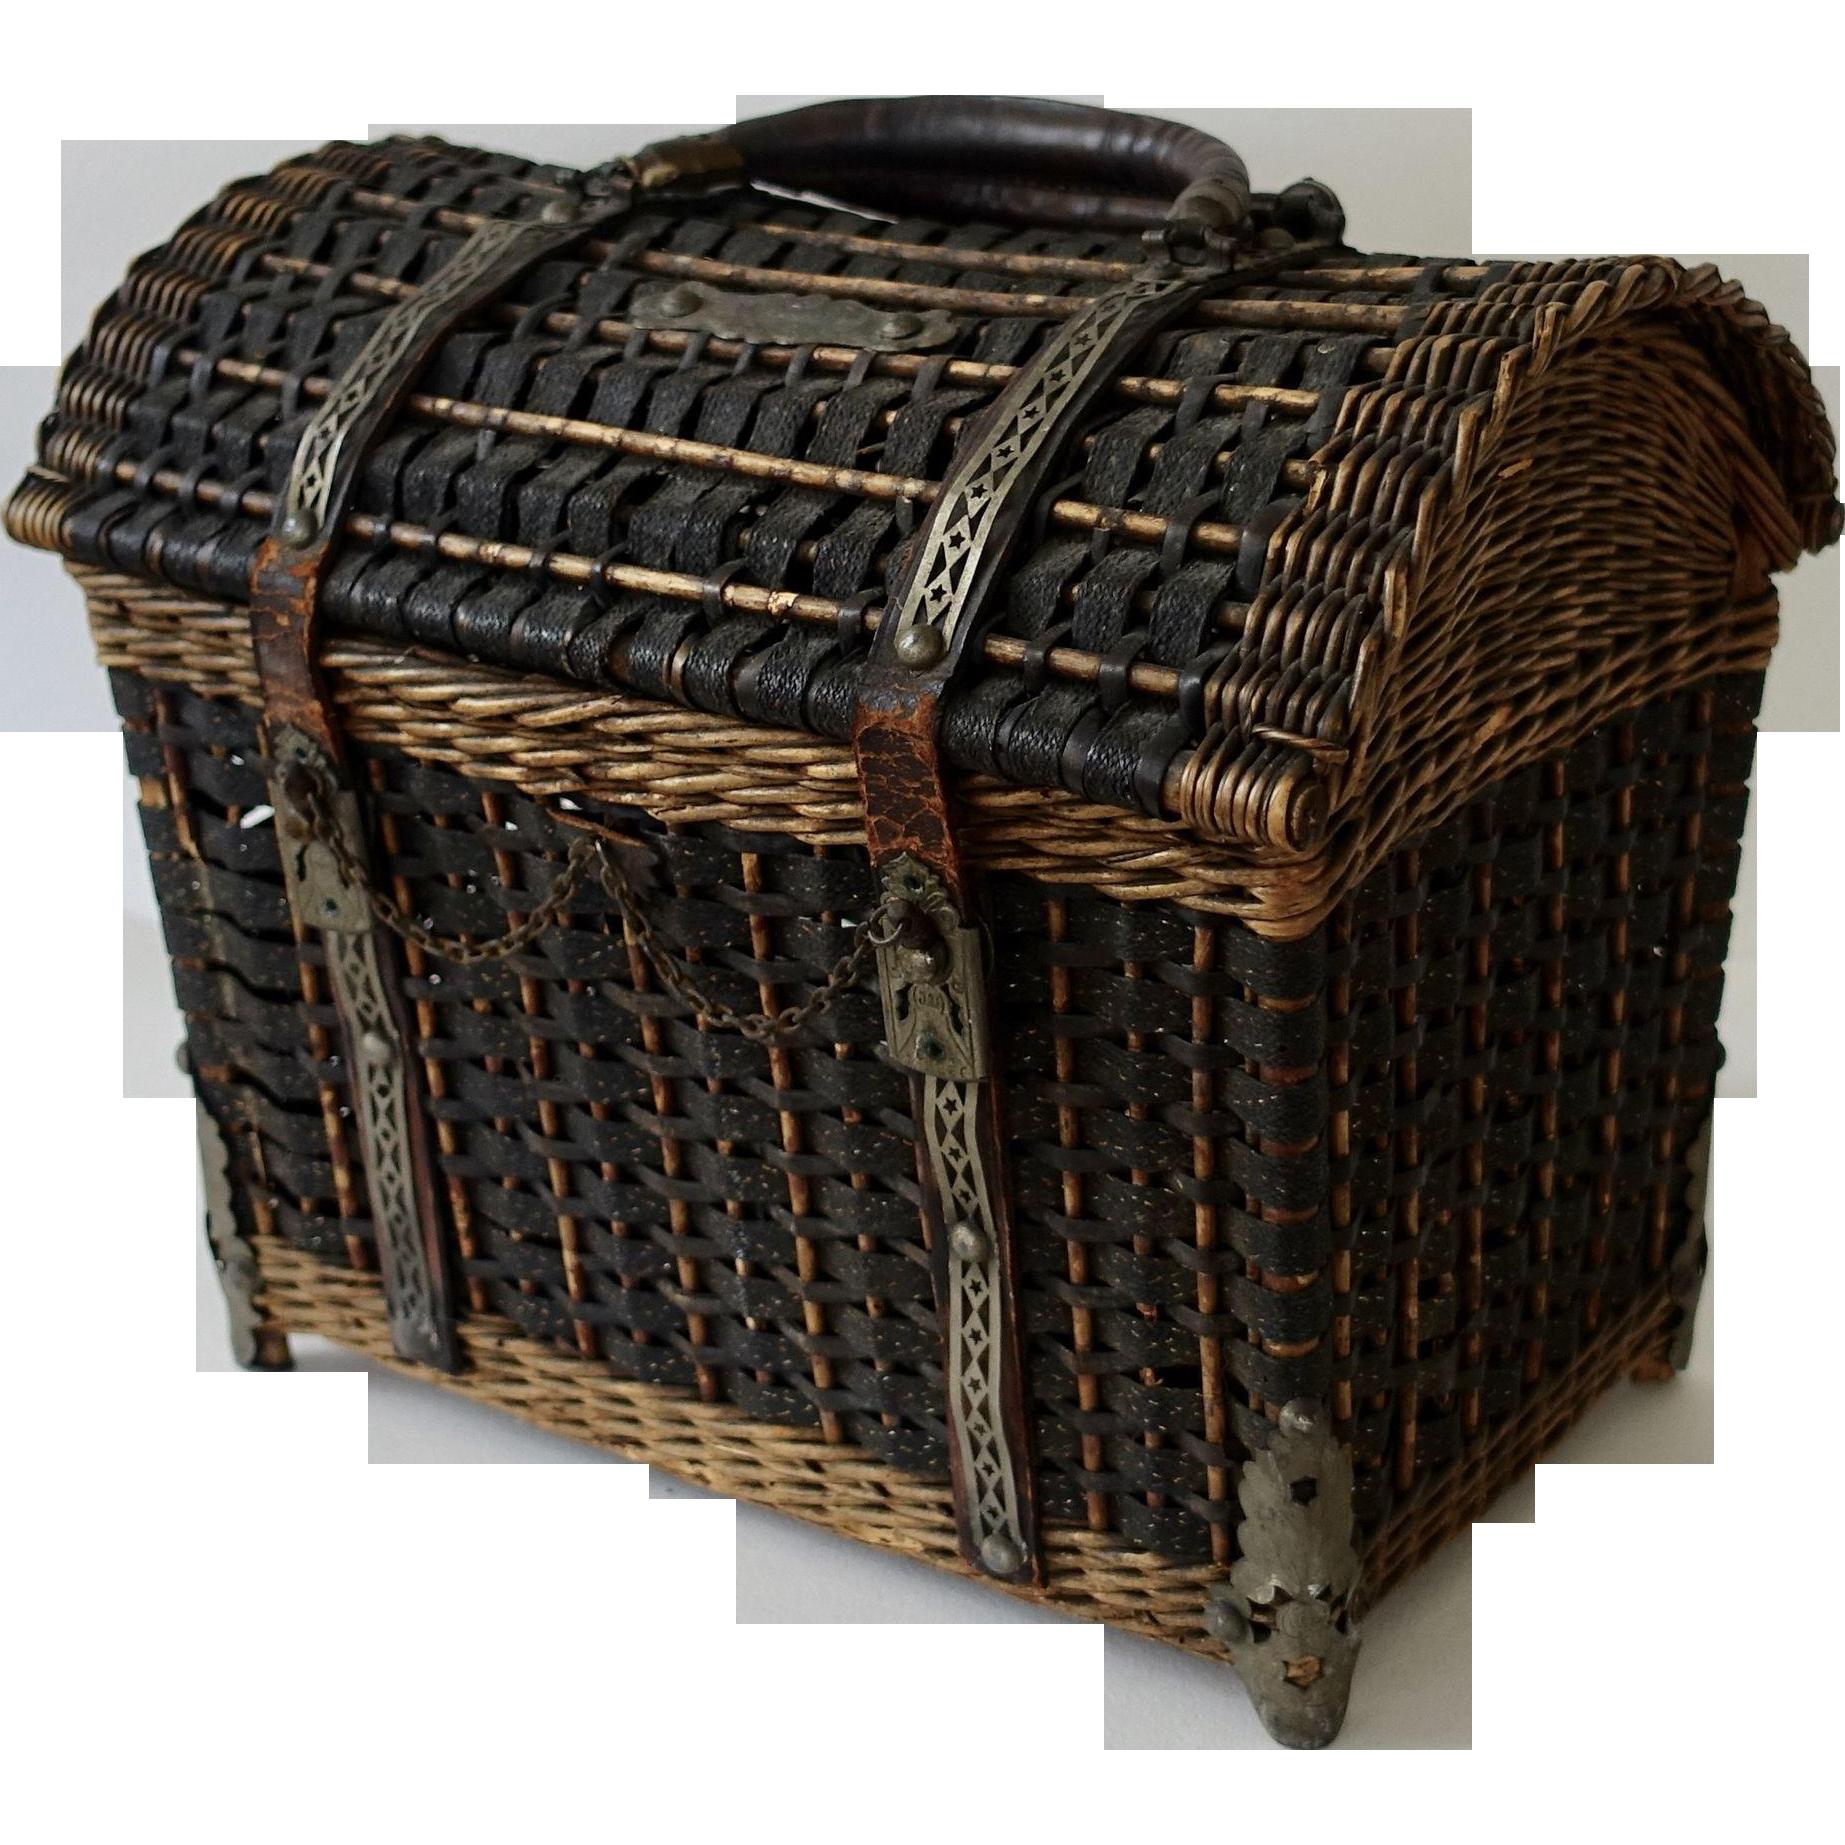 Antique French Ladies Basket Purse, Handbag